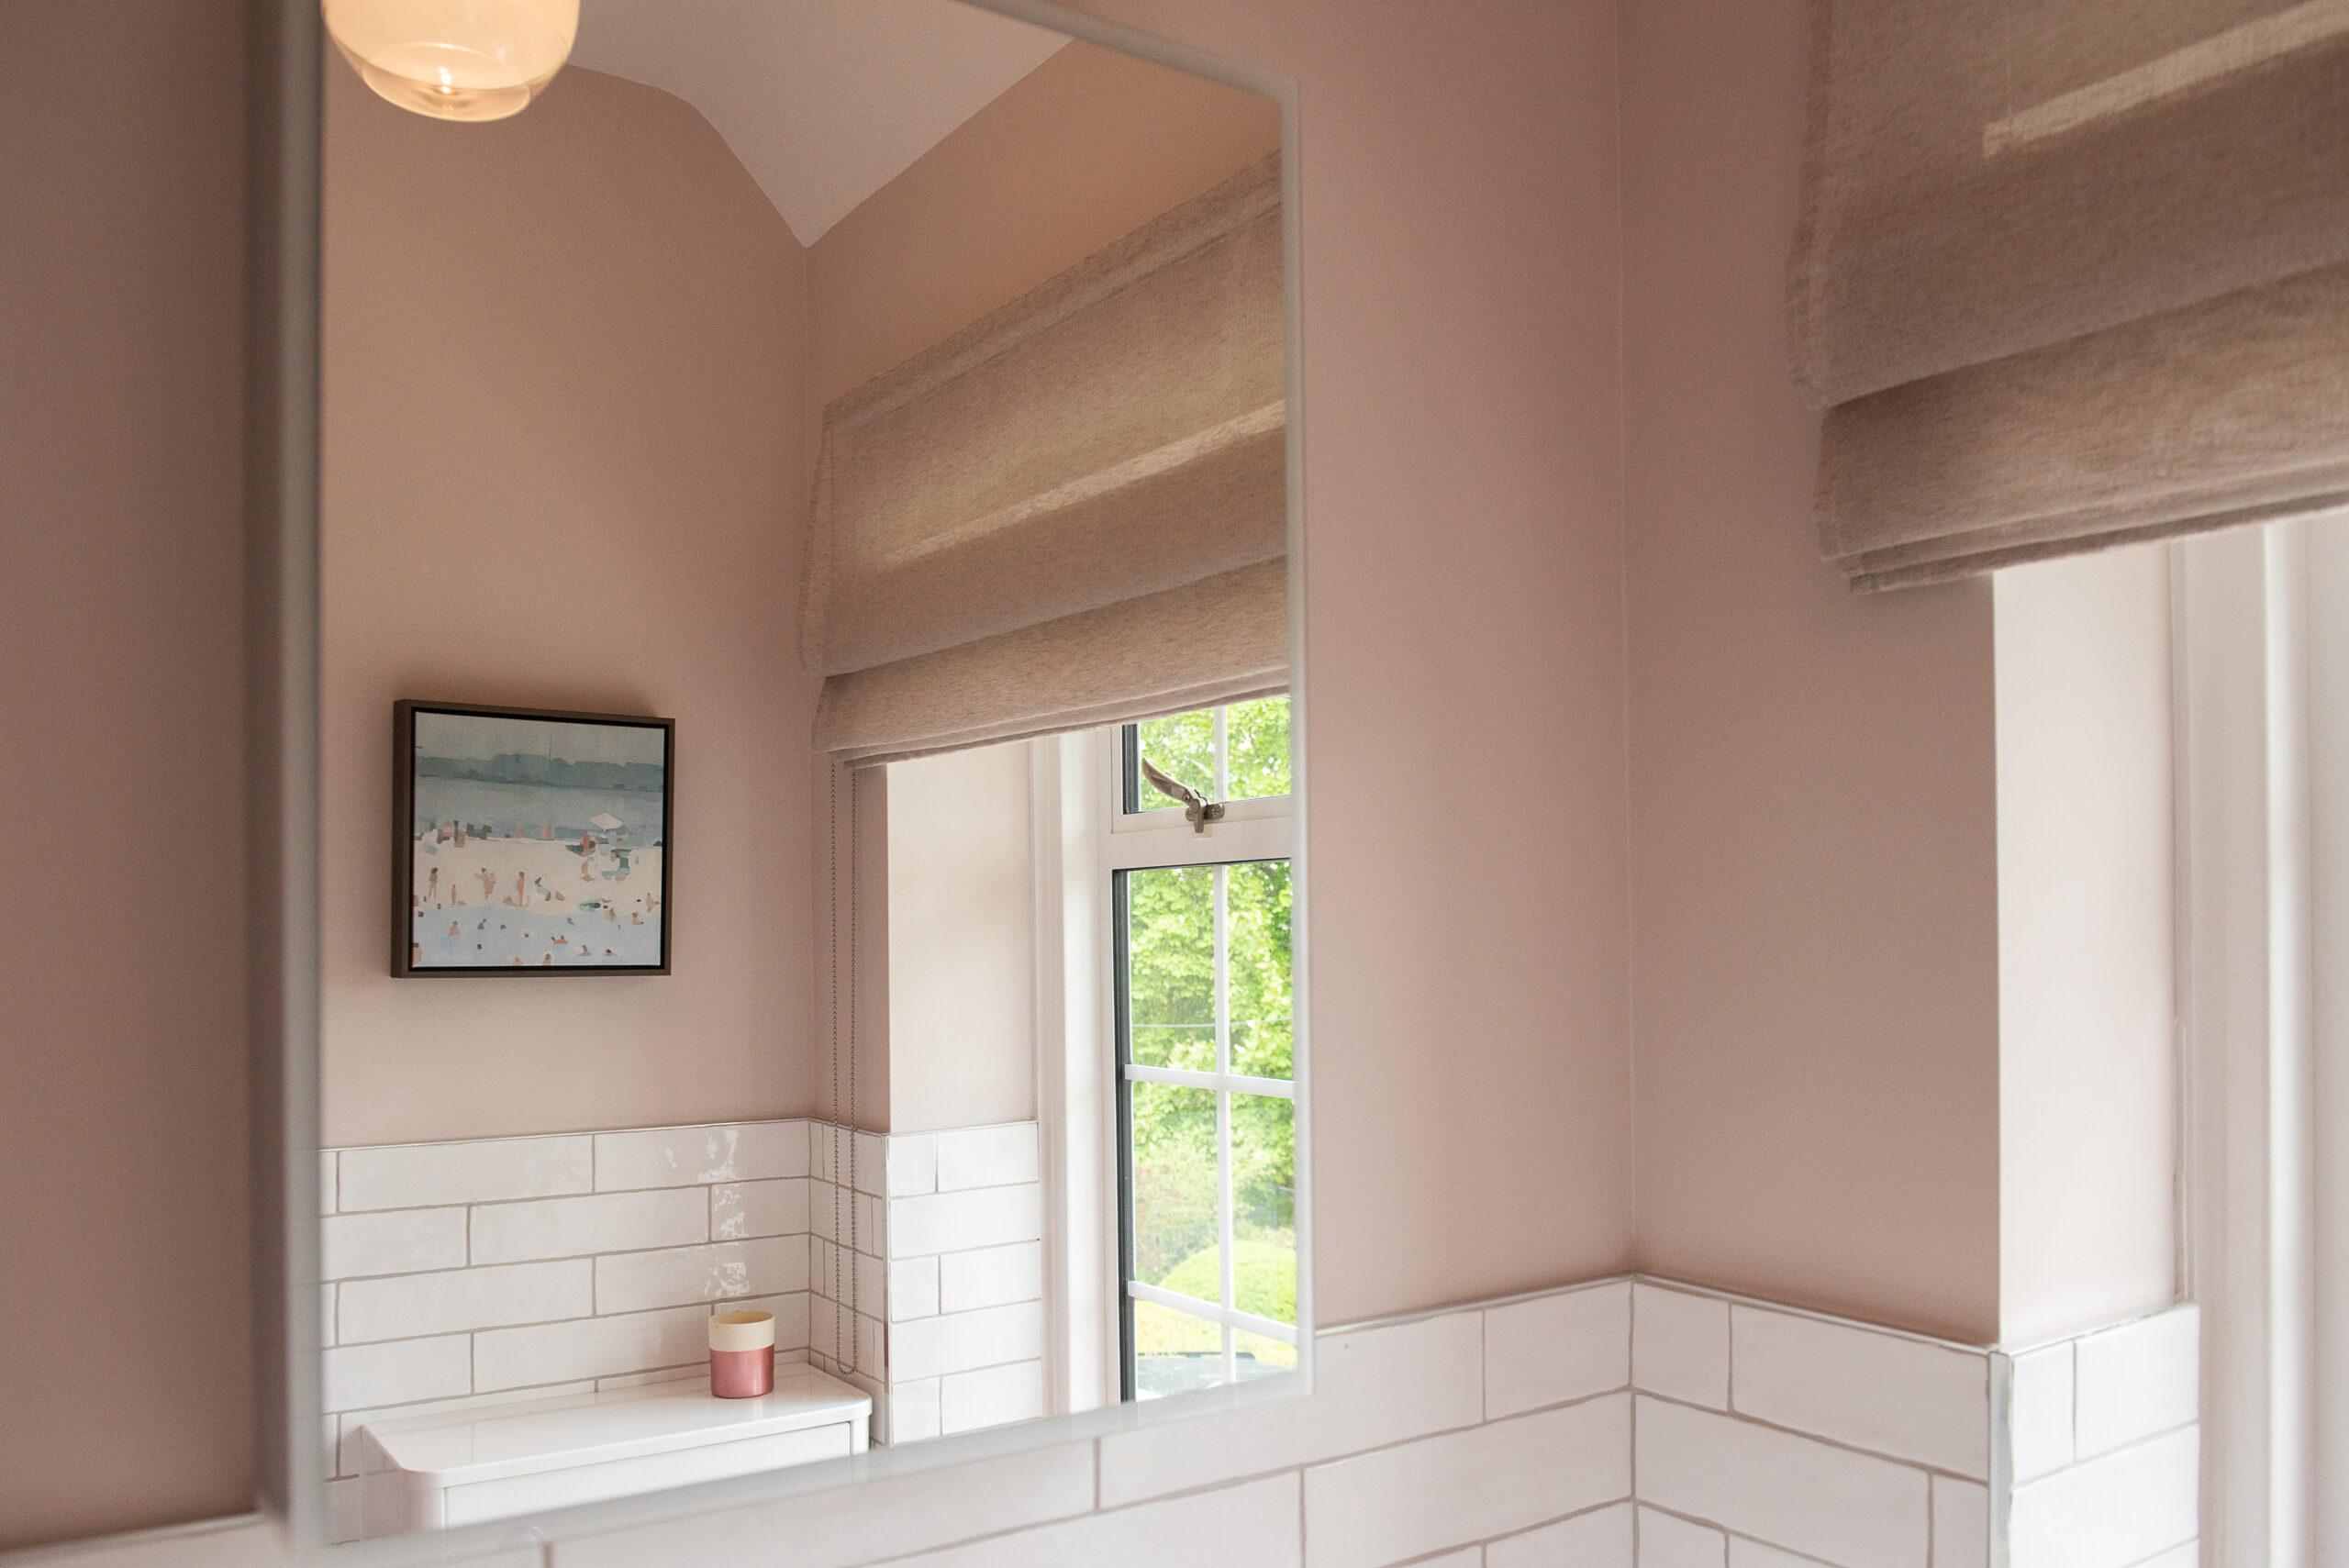 Fairways Goring Ensuite Bathroom Mirror